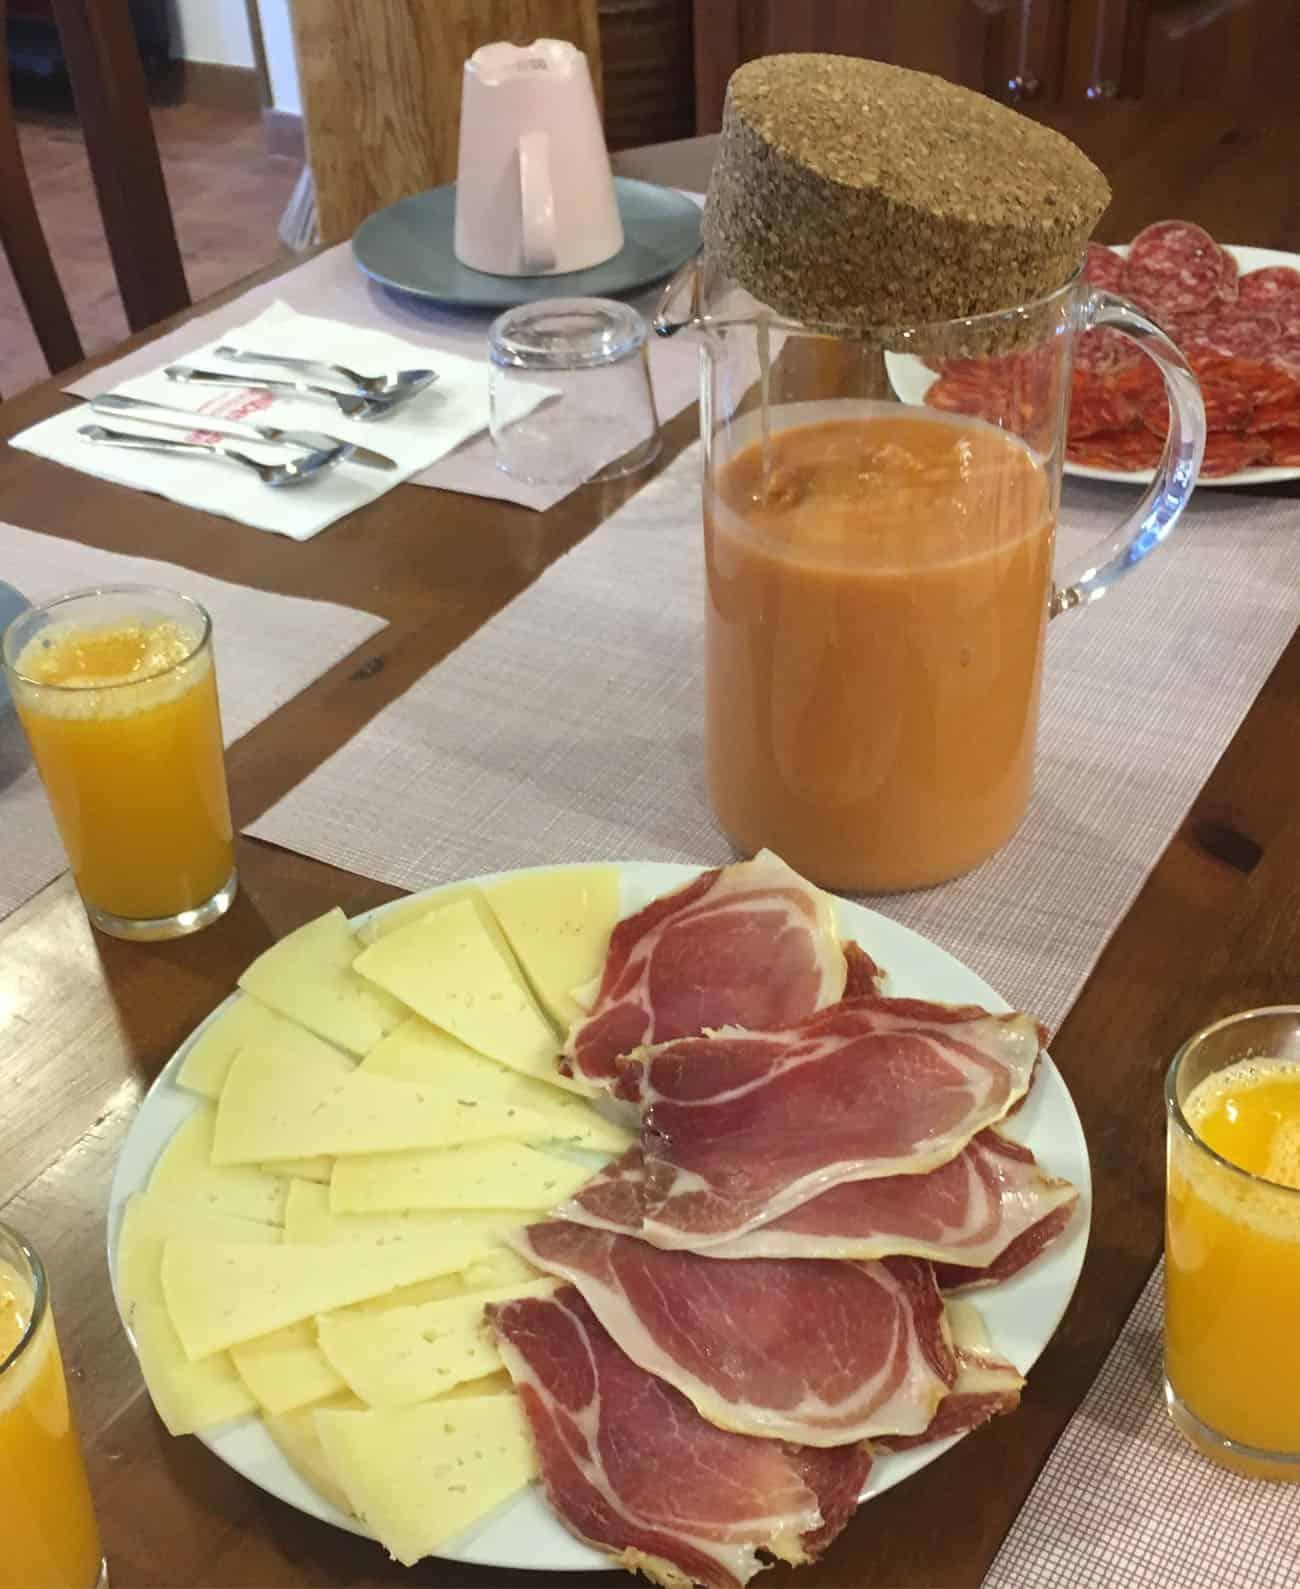 desayuno-especial-elalberguedesiguenza